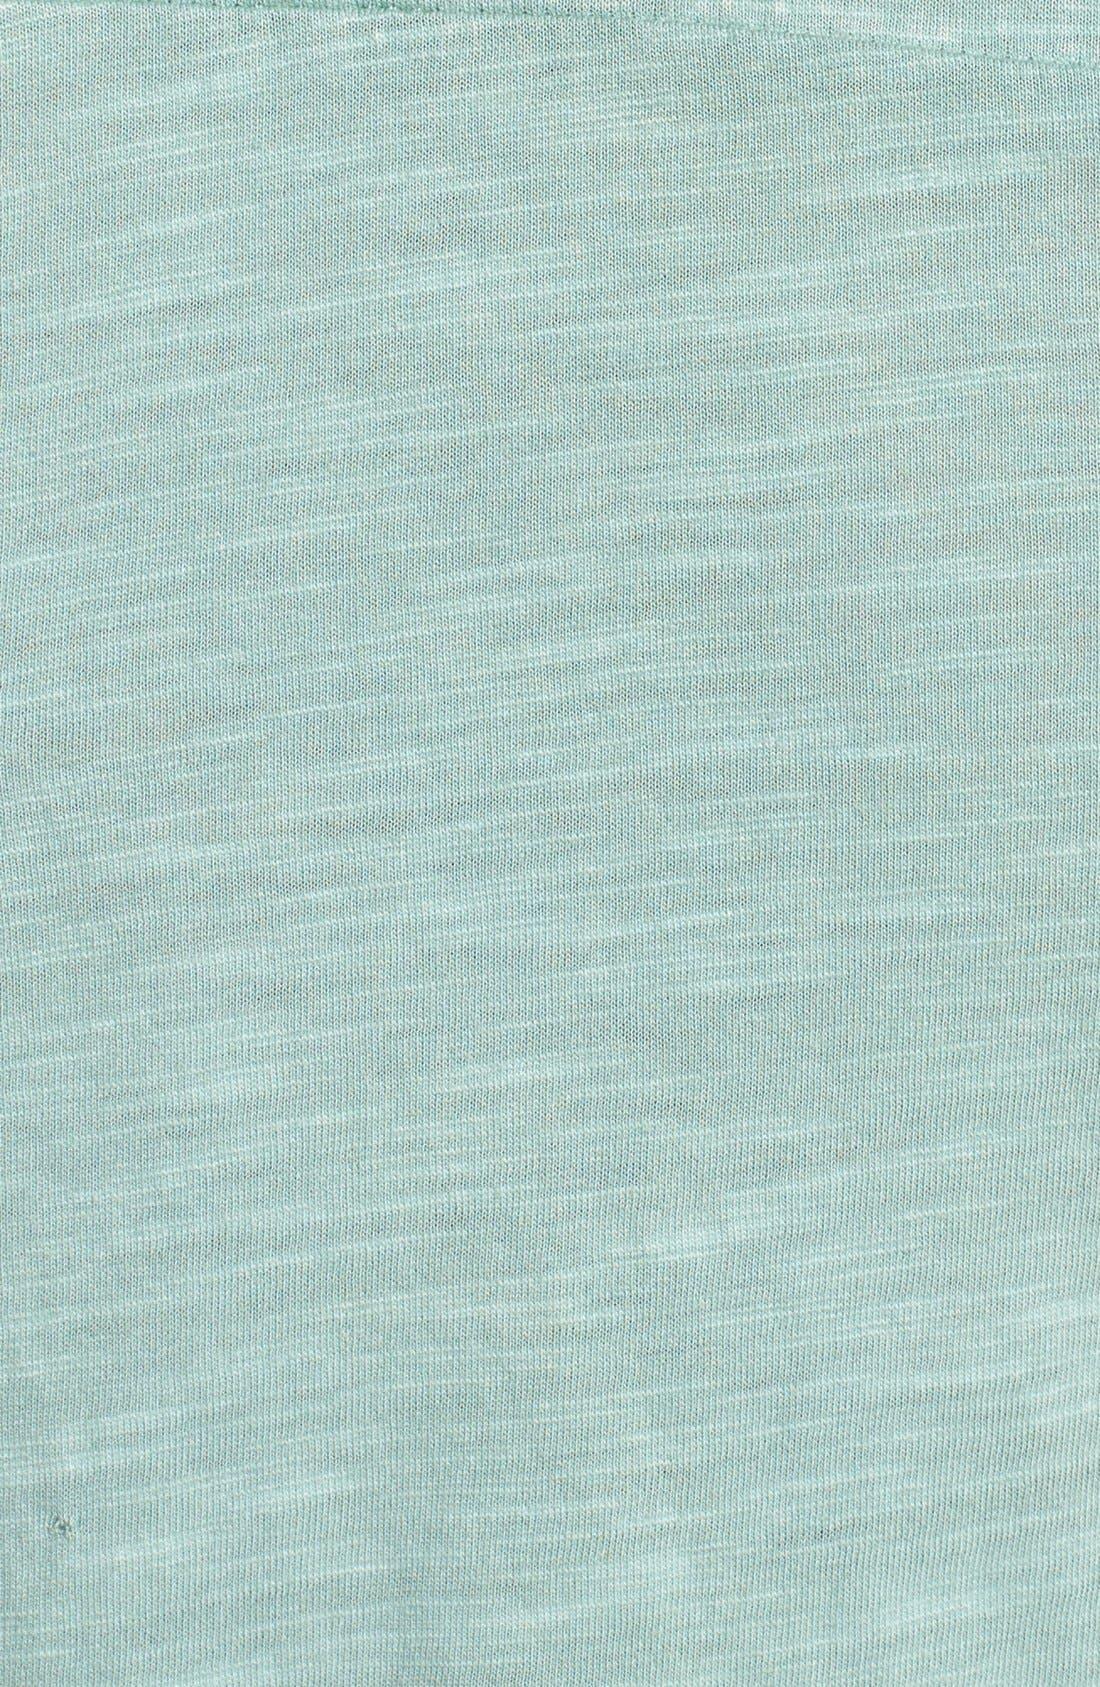 Alternate Image 3  - Volcom 'Ader' Stripe Pocket Tank Top